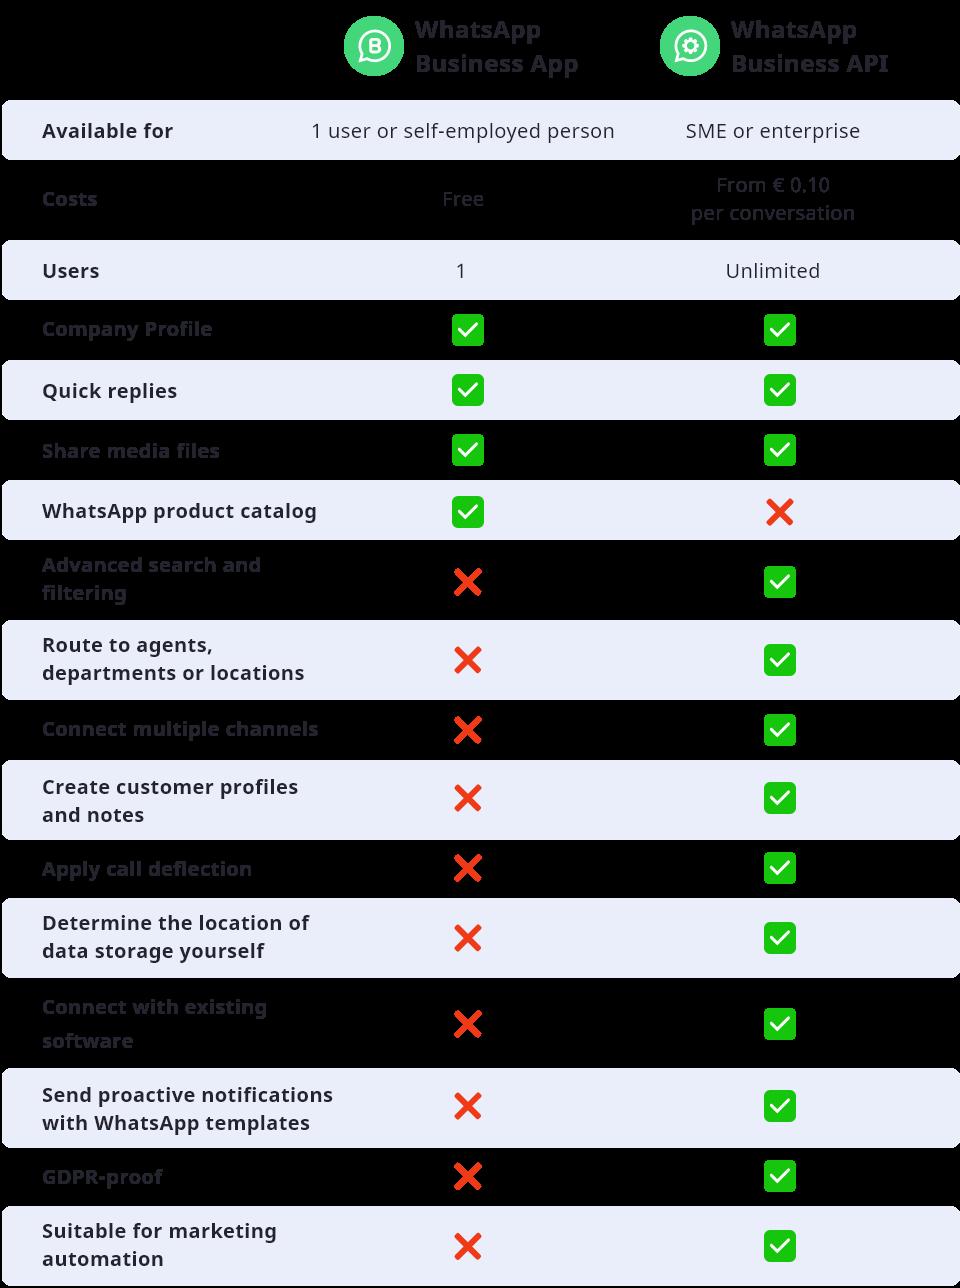 WhatsApp Business App vs. API comparison